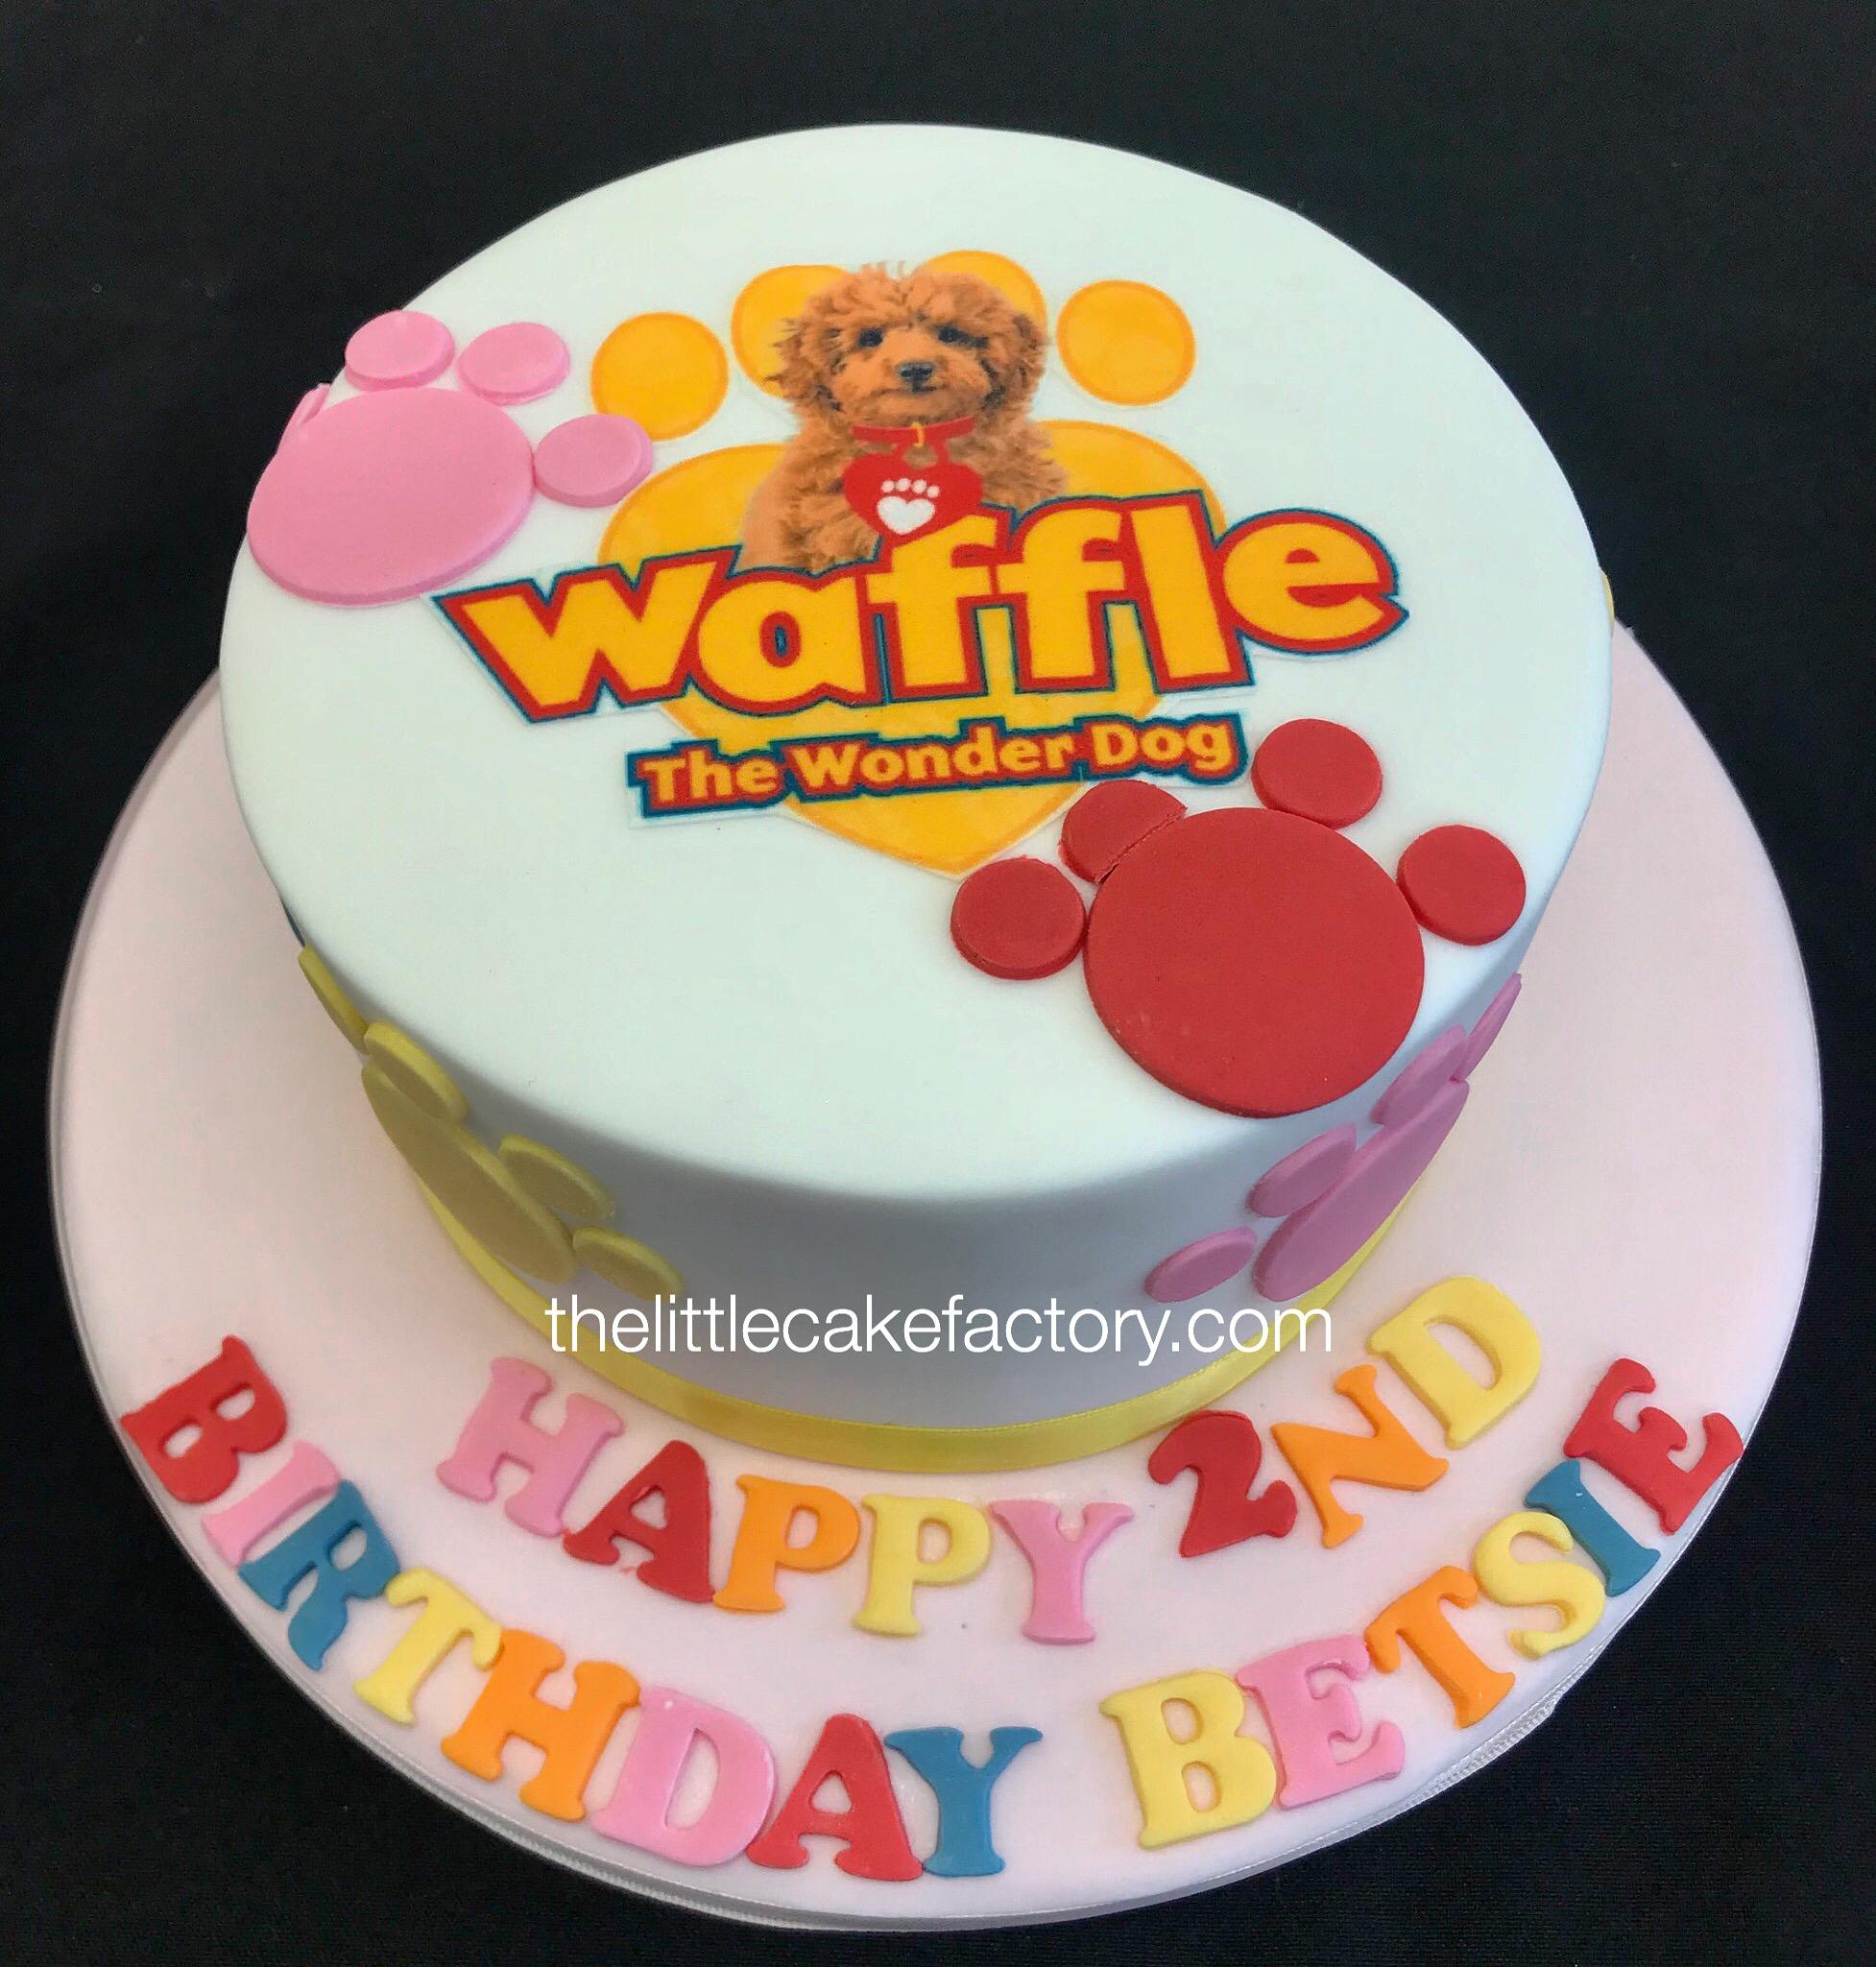 Phenomenal Birthday Cakes Wedding Cakes Bar Mitzvah Cakes Essex London Funny Birthday Cards Online Sheoxdamsfinfo